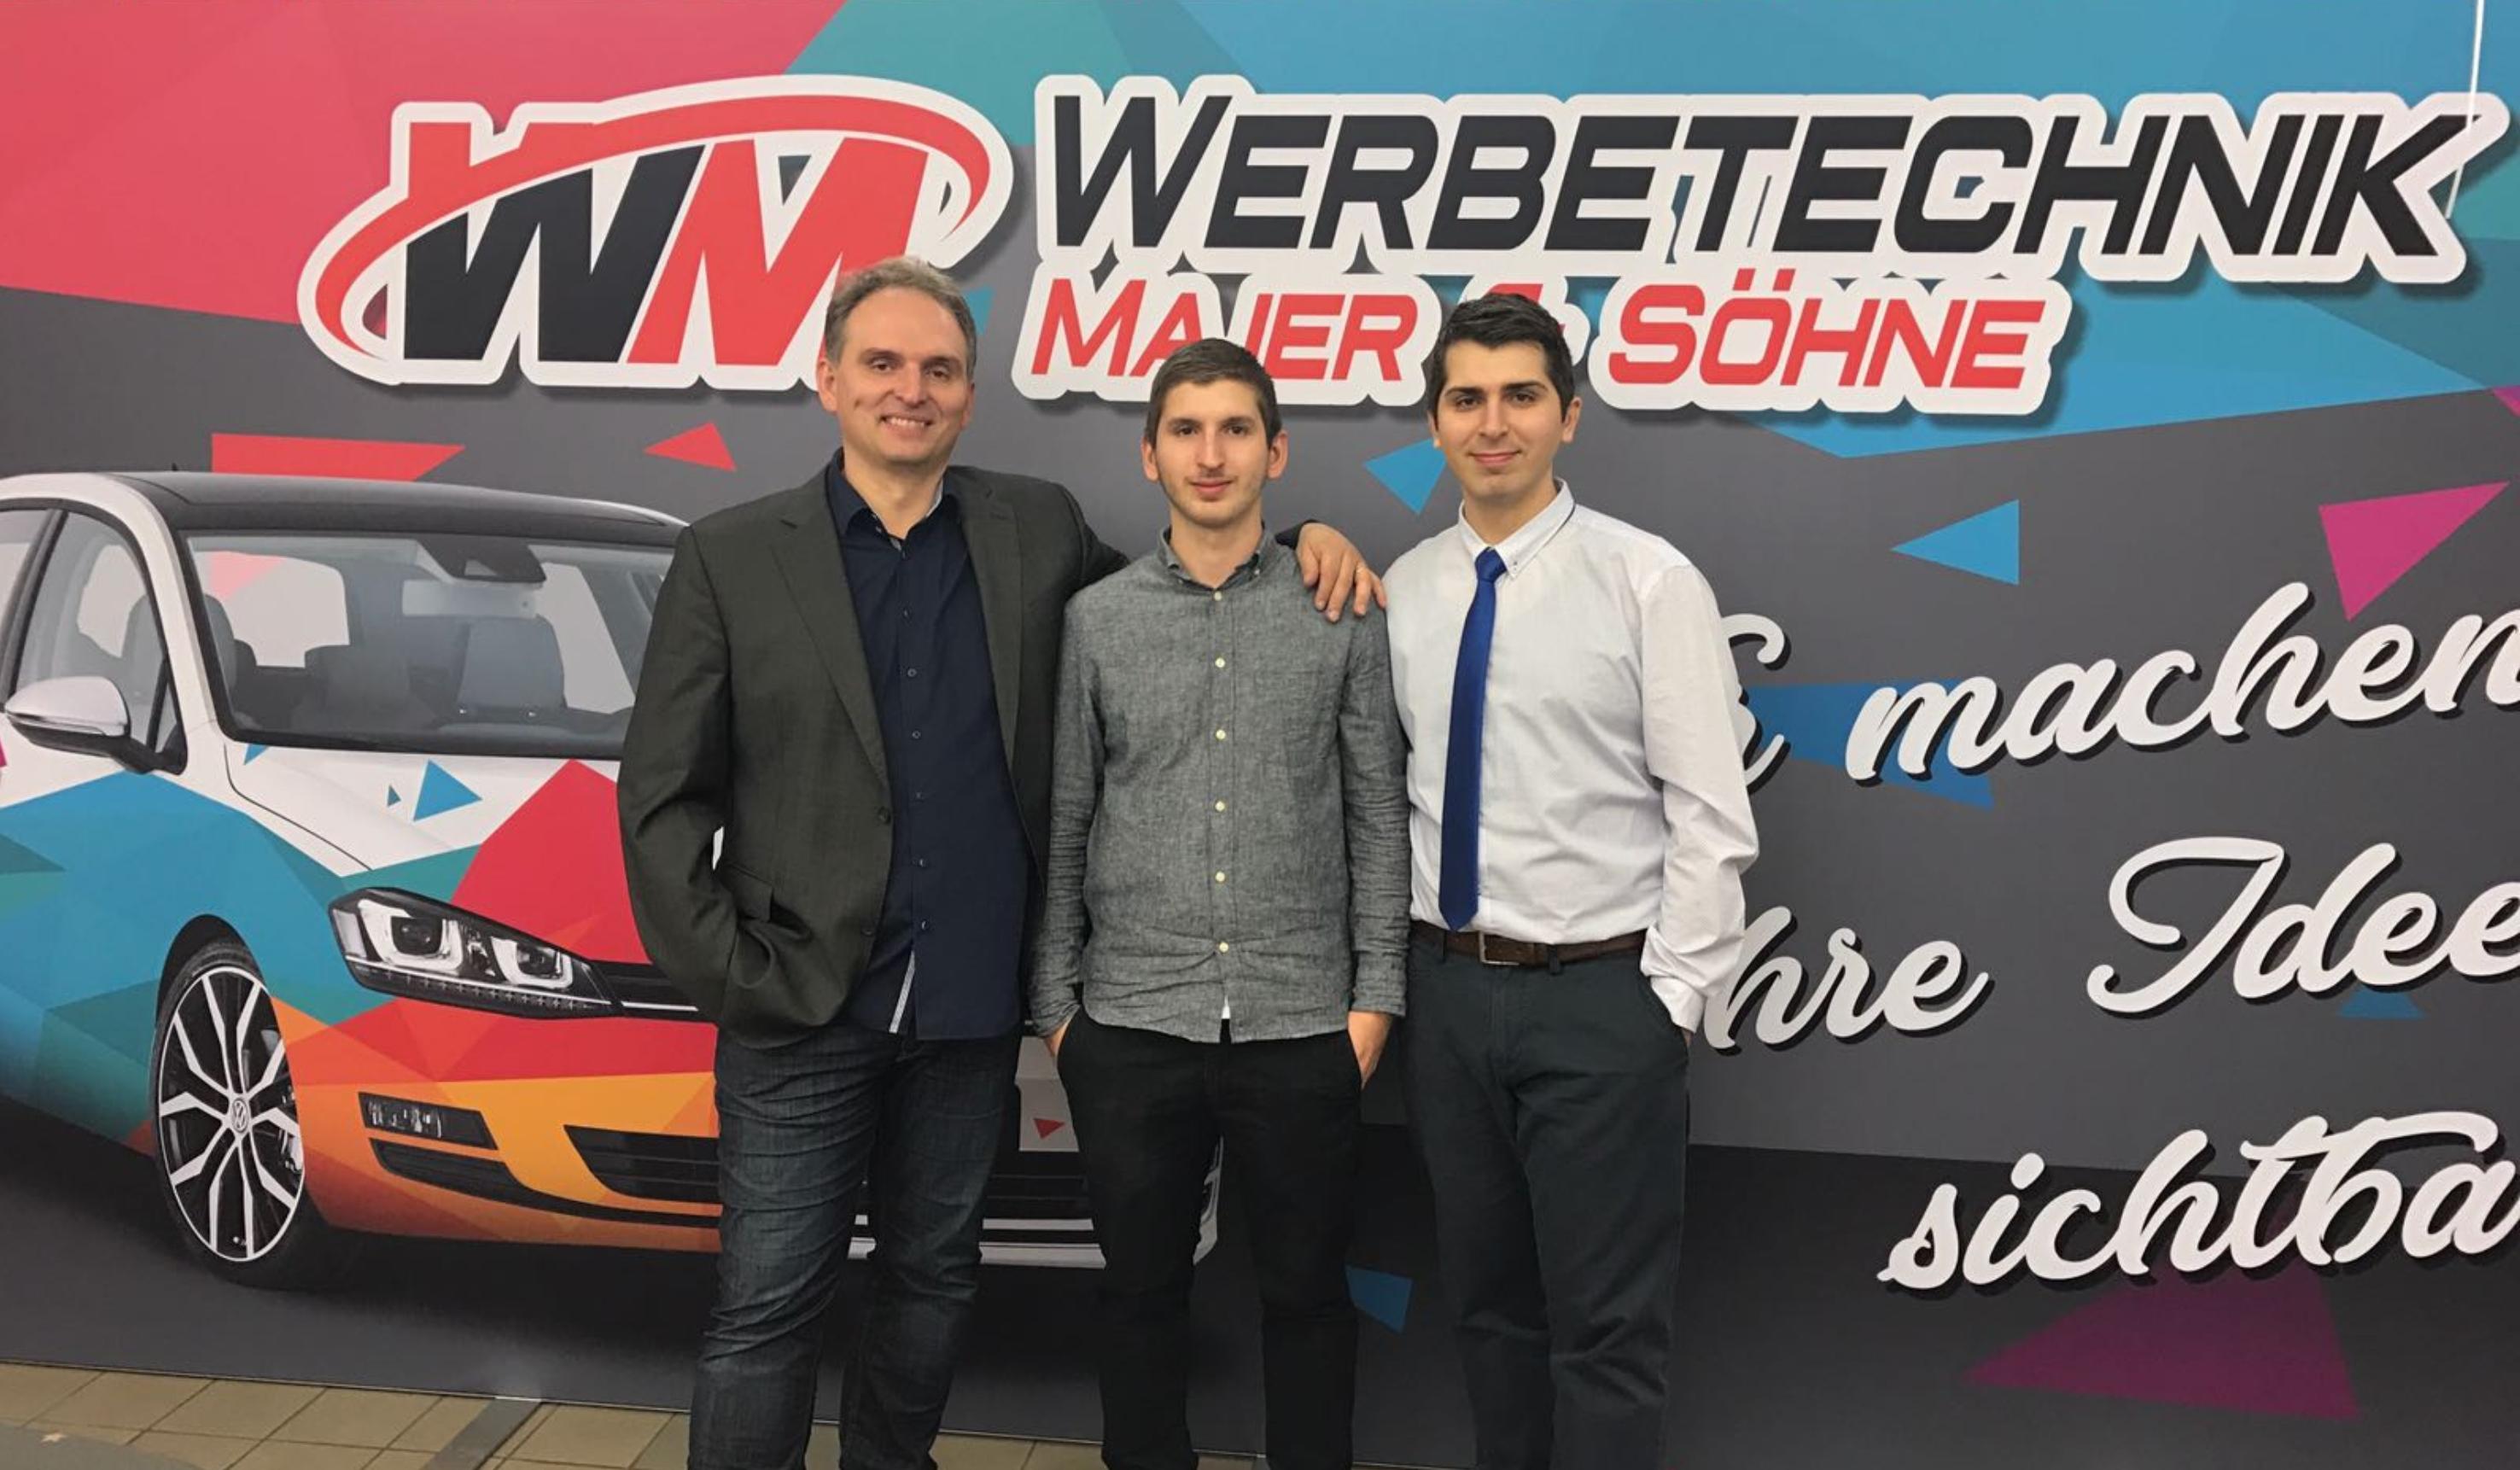 Werbetechnik Majer & Söhne GmbH & Co KG